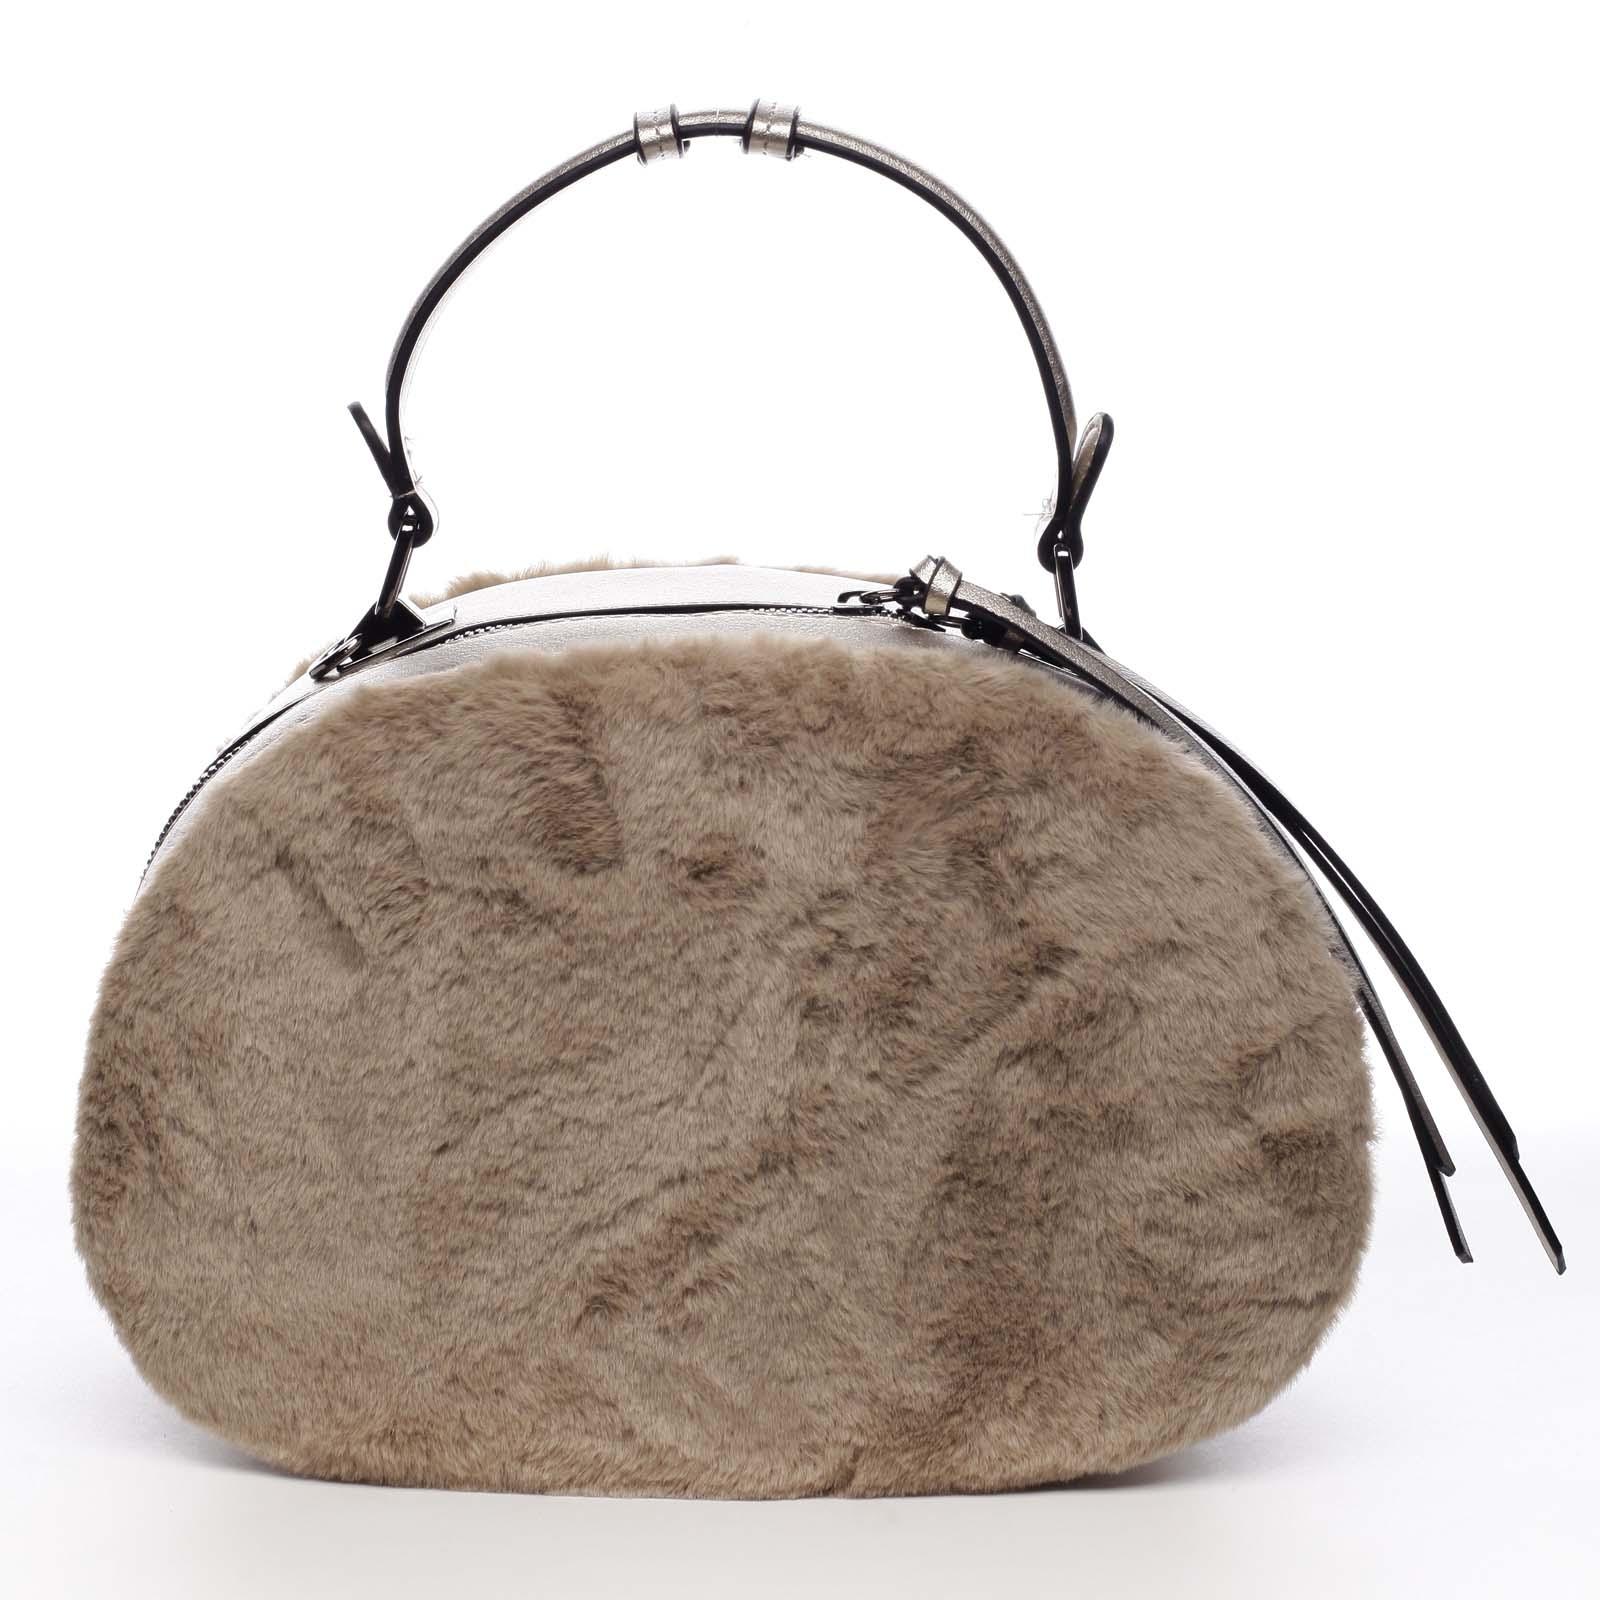 Dámská kožešinová kabelka meruňková - MARIA C Hasiel